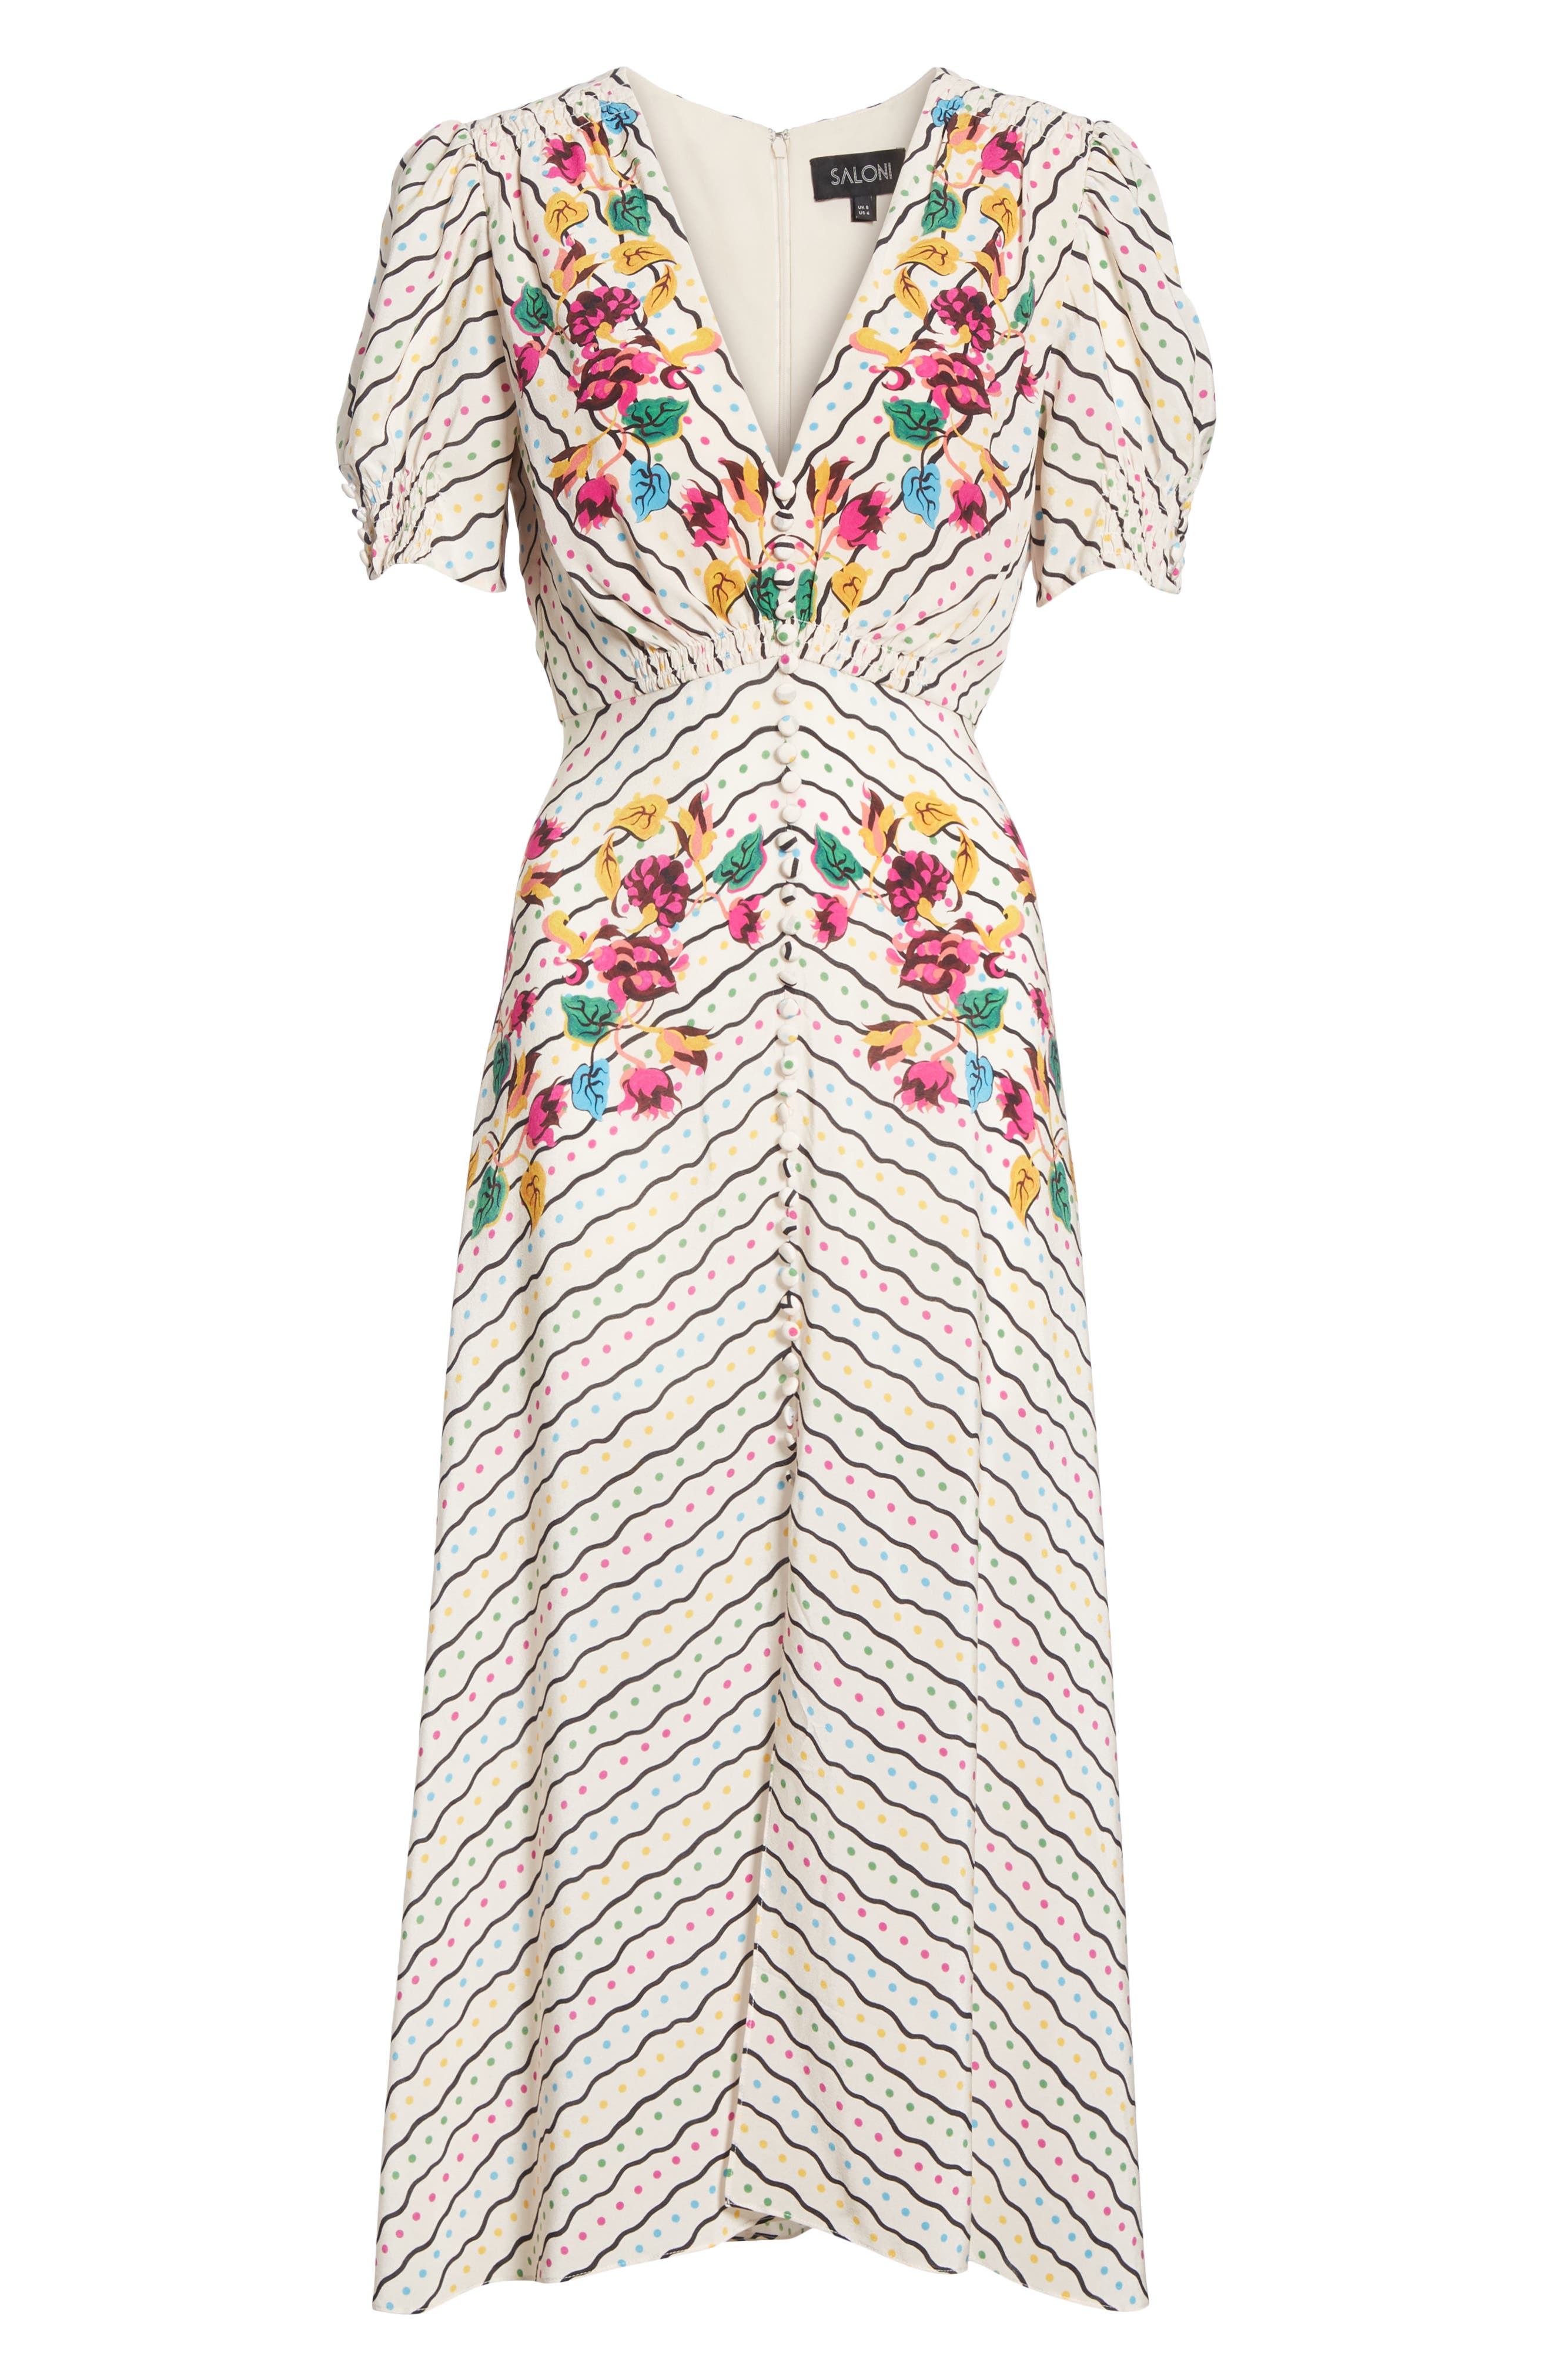 SALONI, Lea Silk Midi Dress, Alternate thumbnail 7, color, JAPONICA WIGGLE PLACEMENT